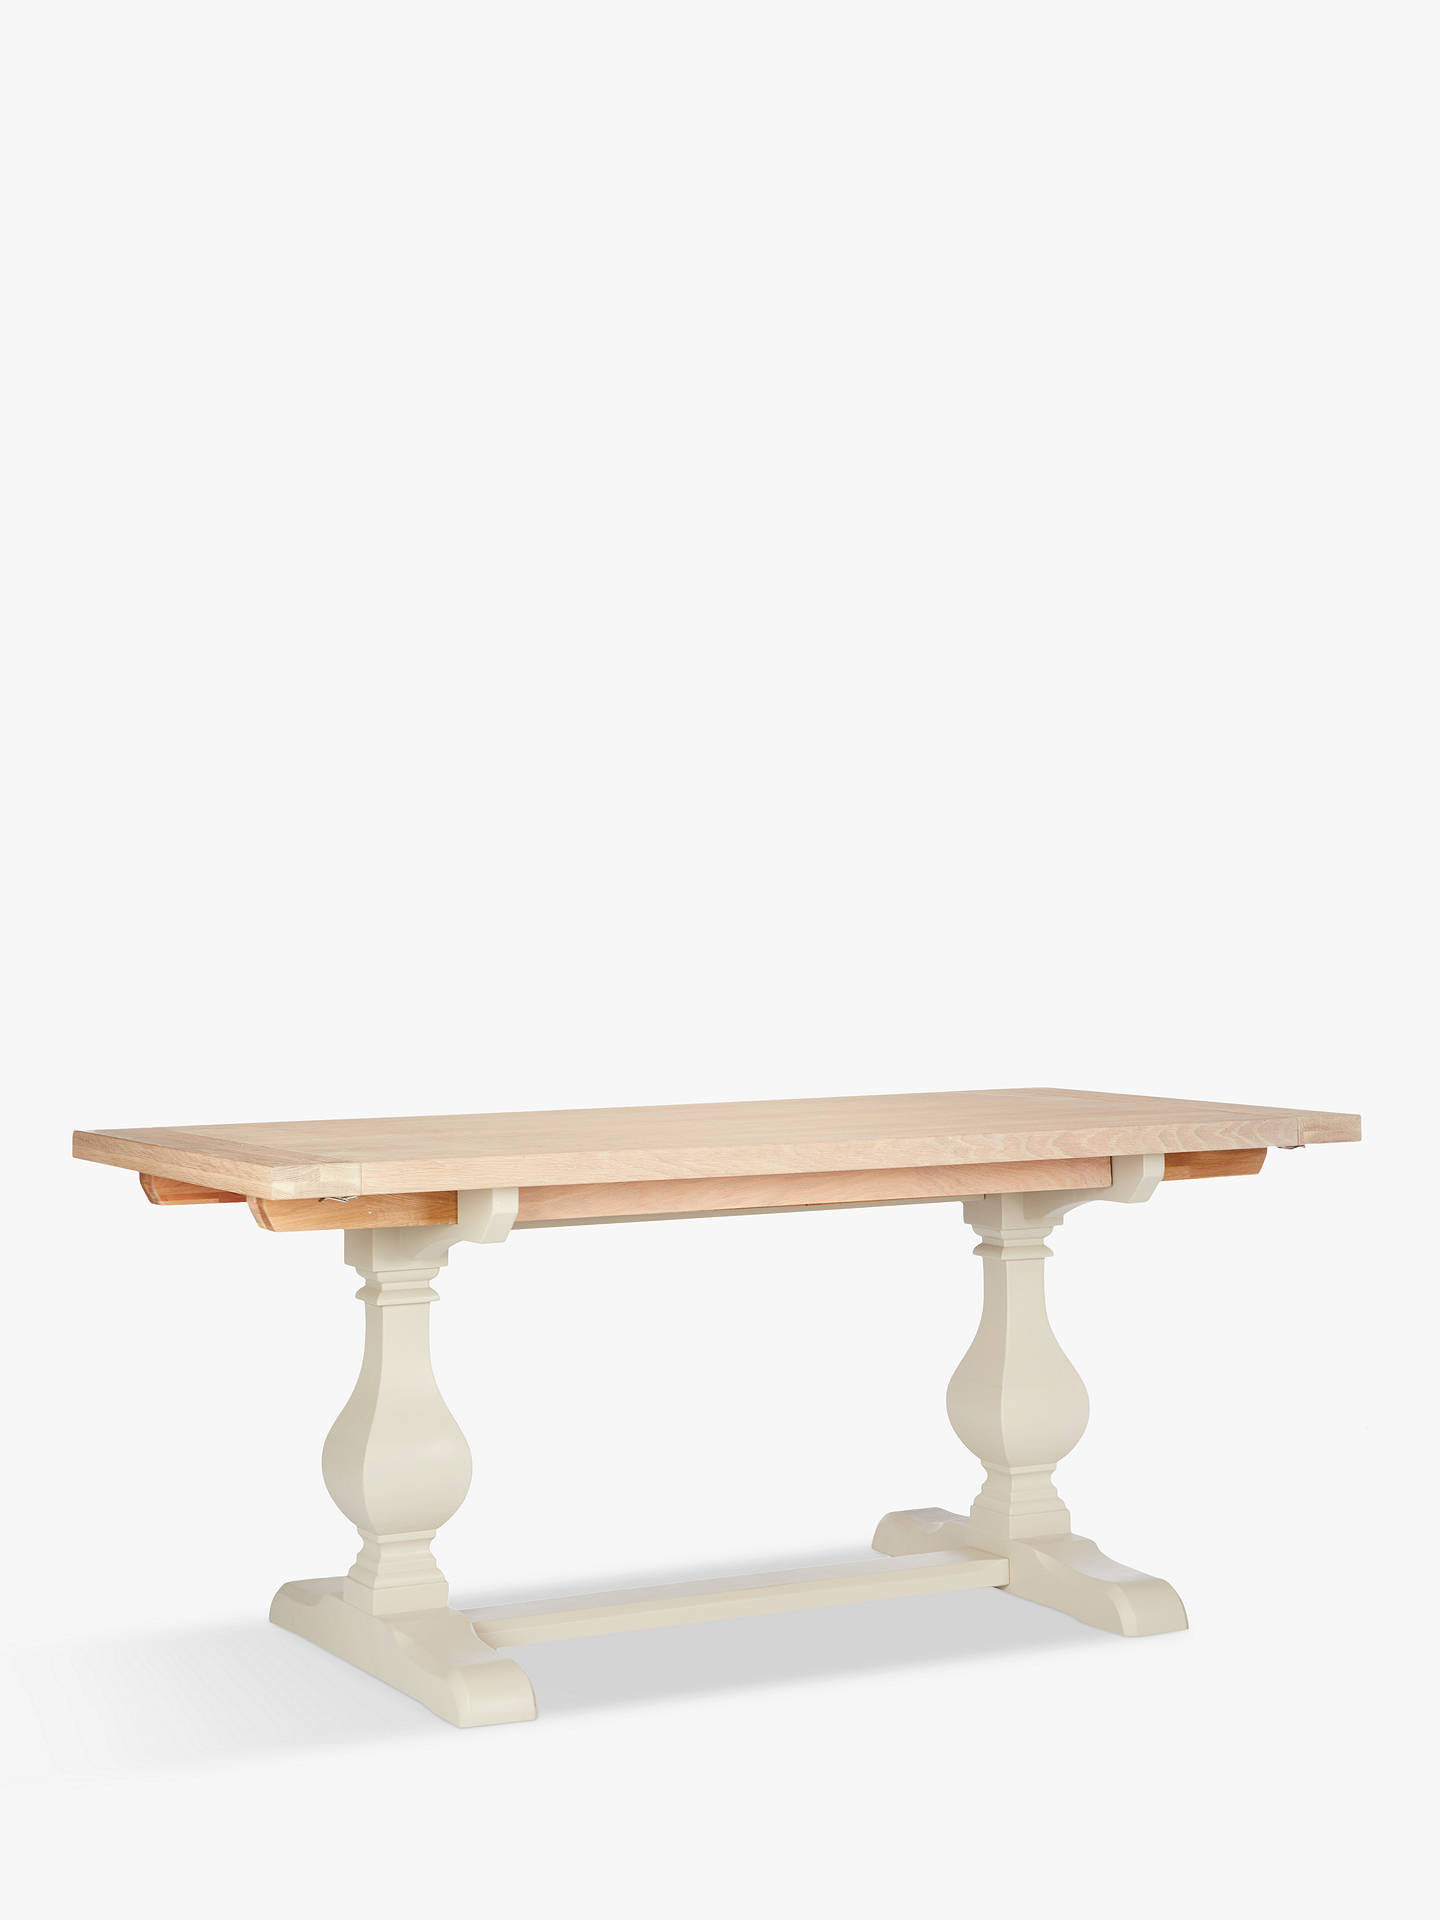 john lewis partners wickham 6 8 seater extending dining. Black Bedroom Furniture Sets. Home Design Ideas